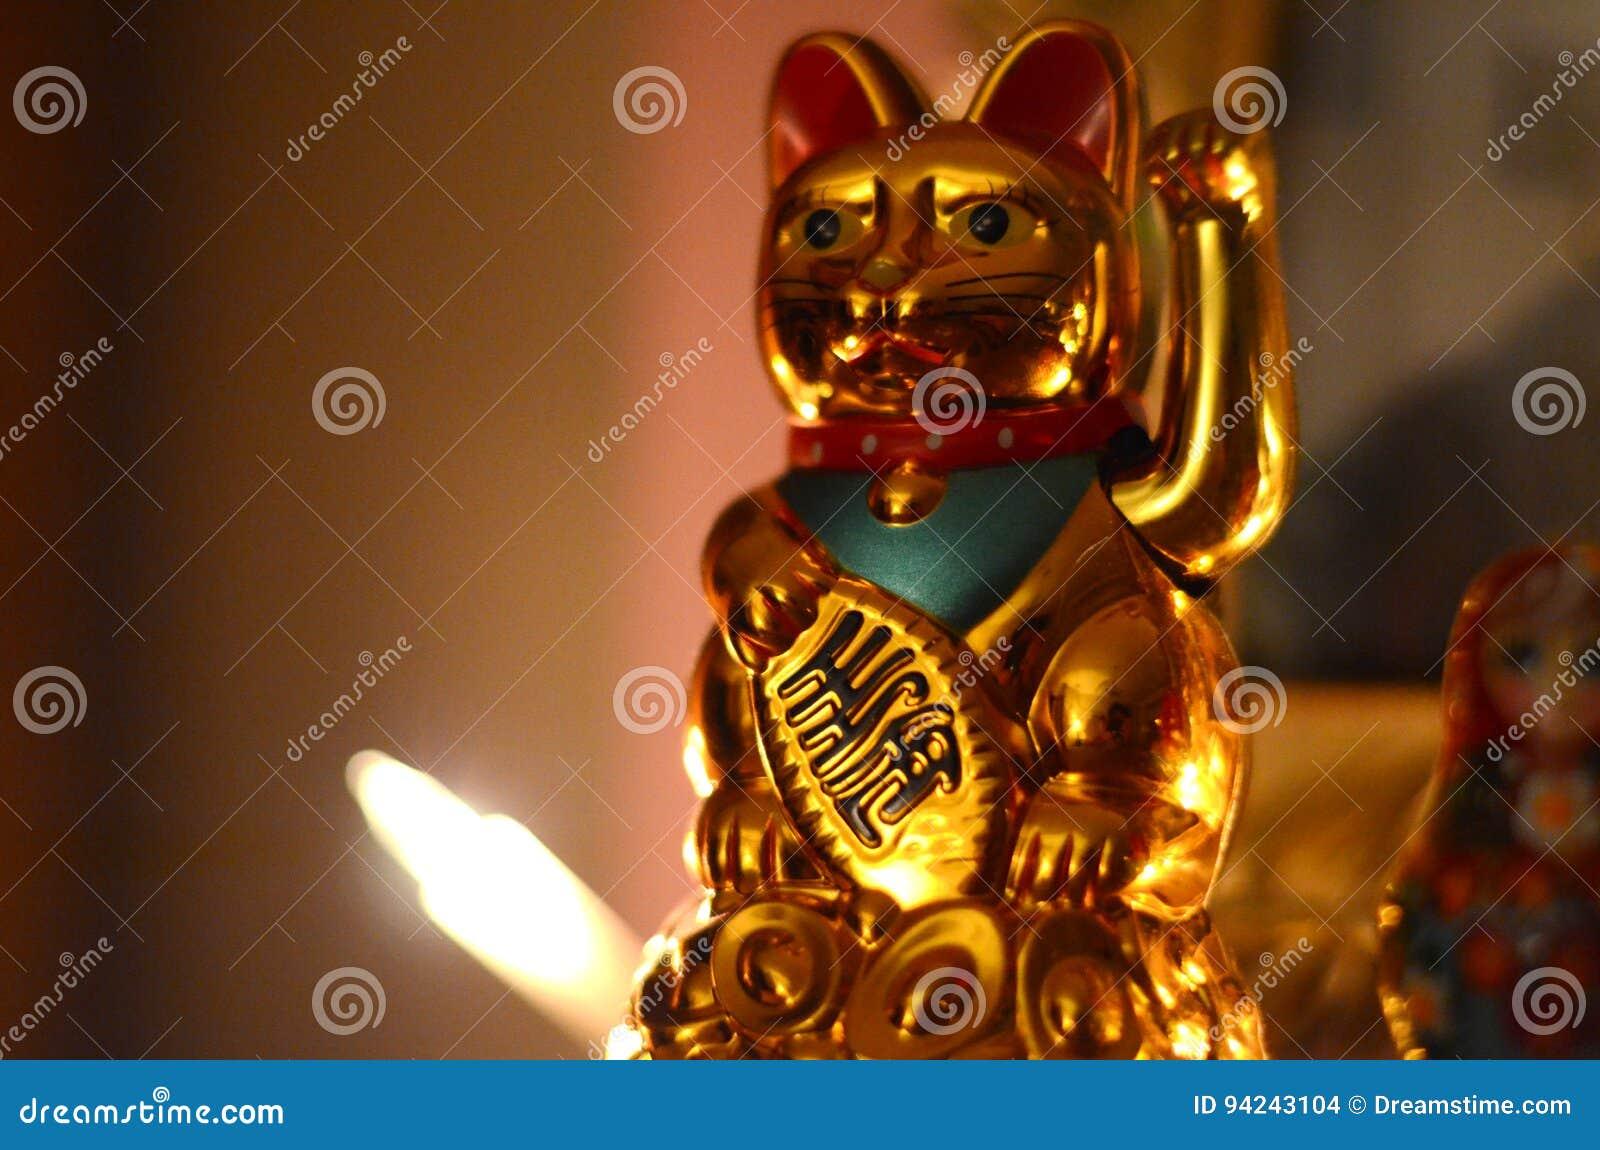 Golden Maneki Neko, the Lucky Cat